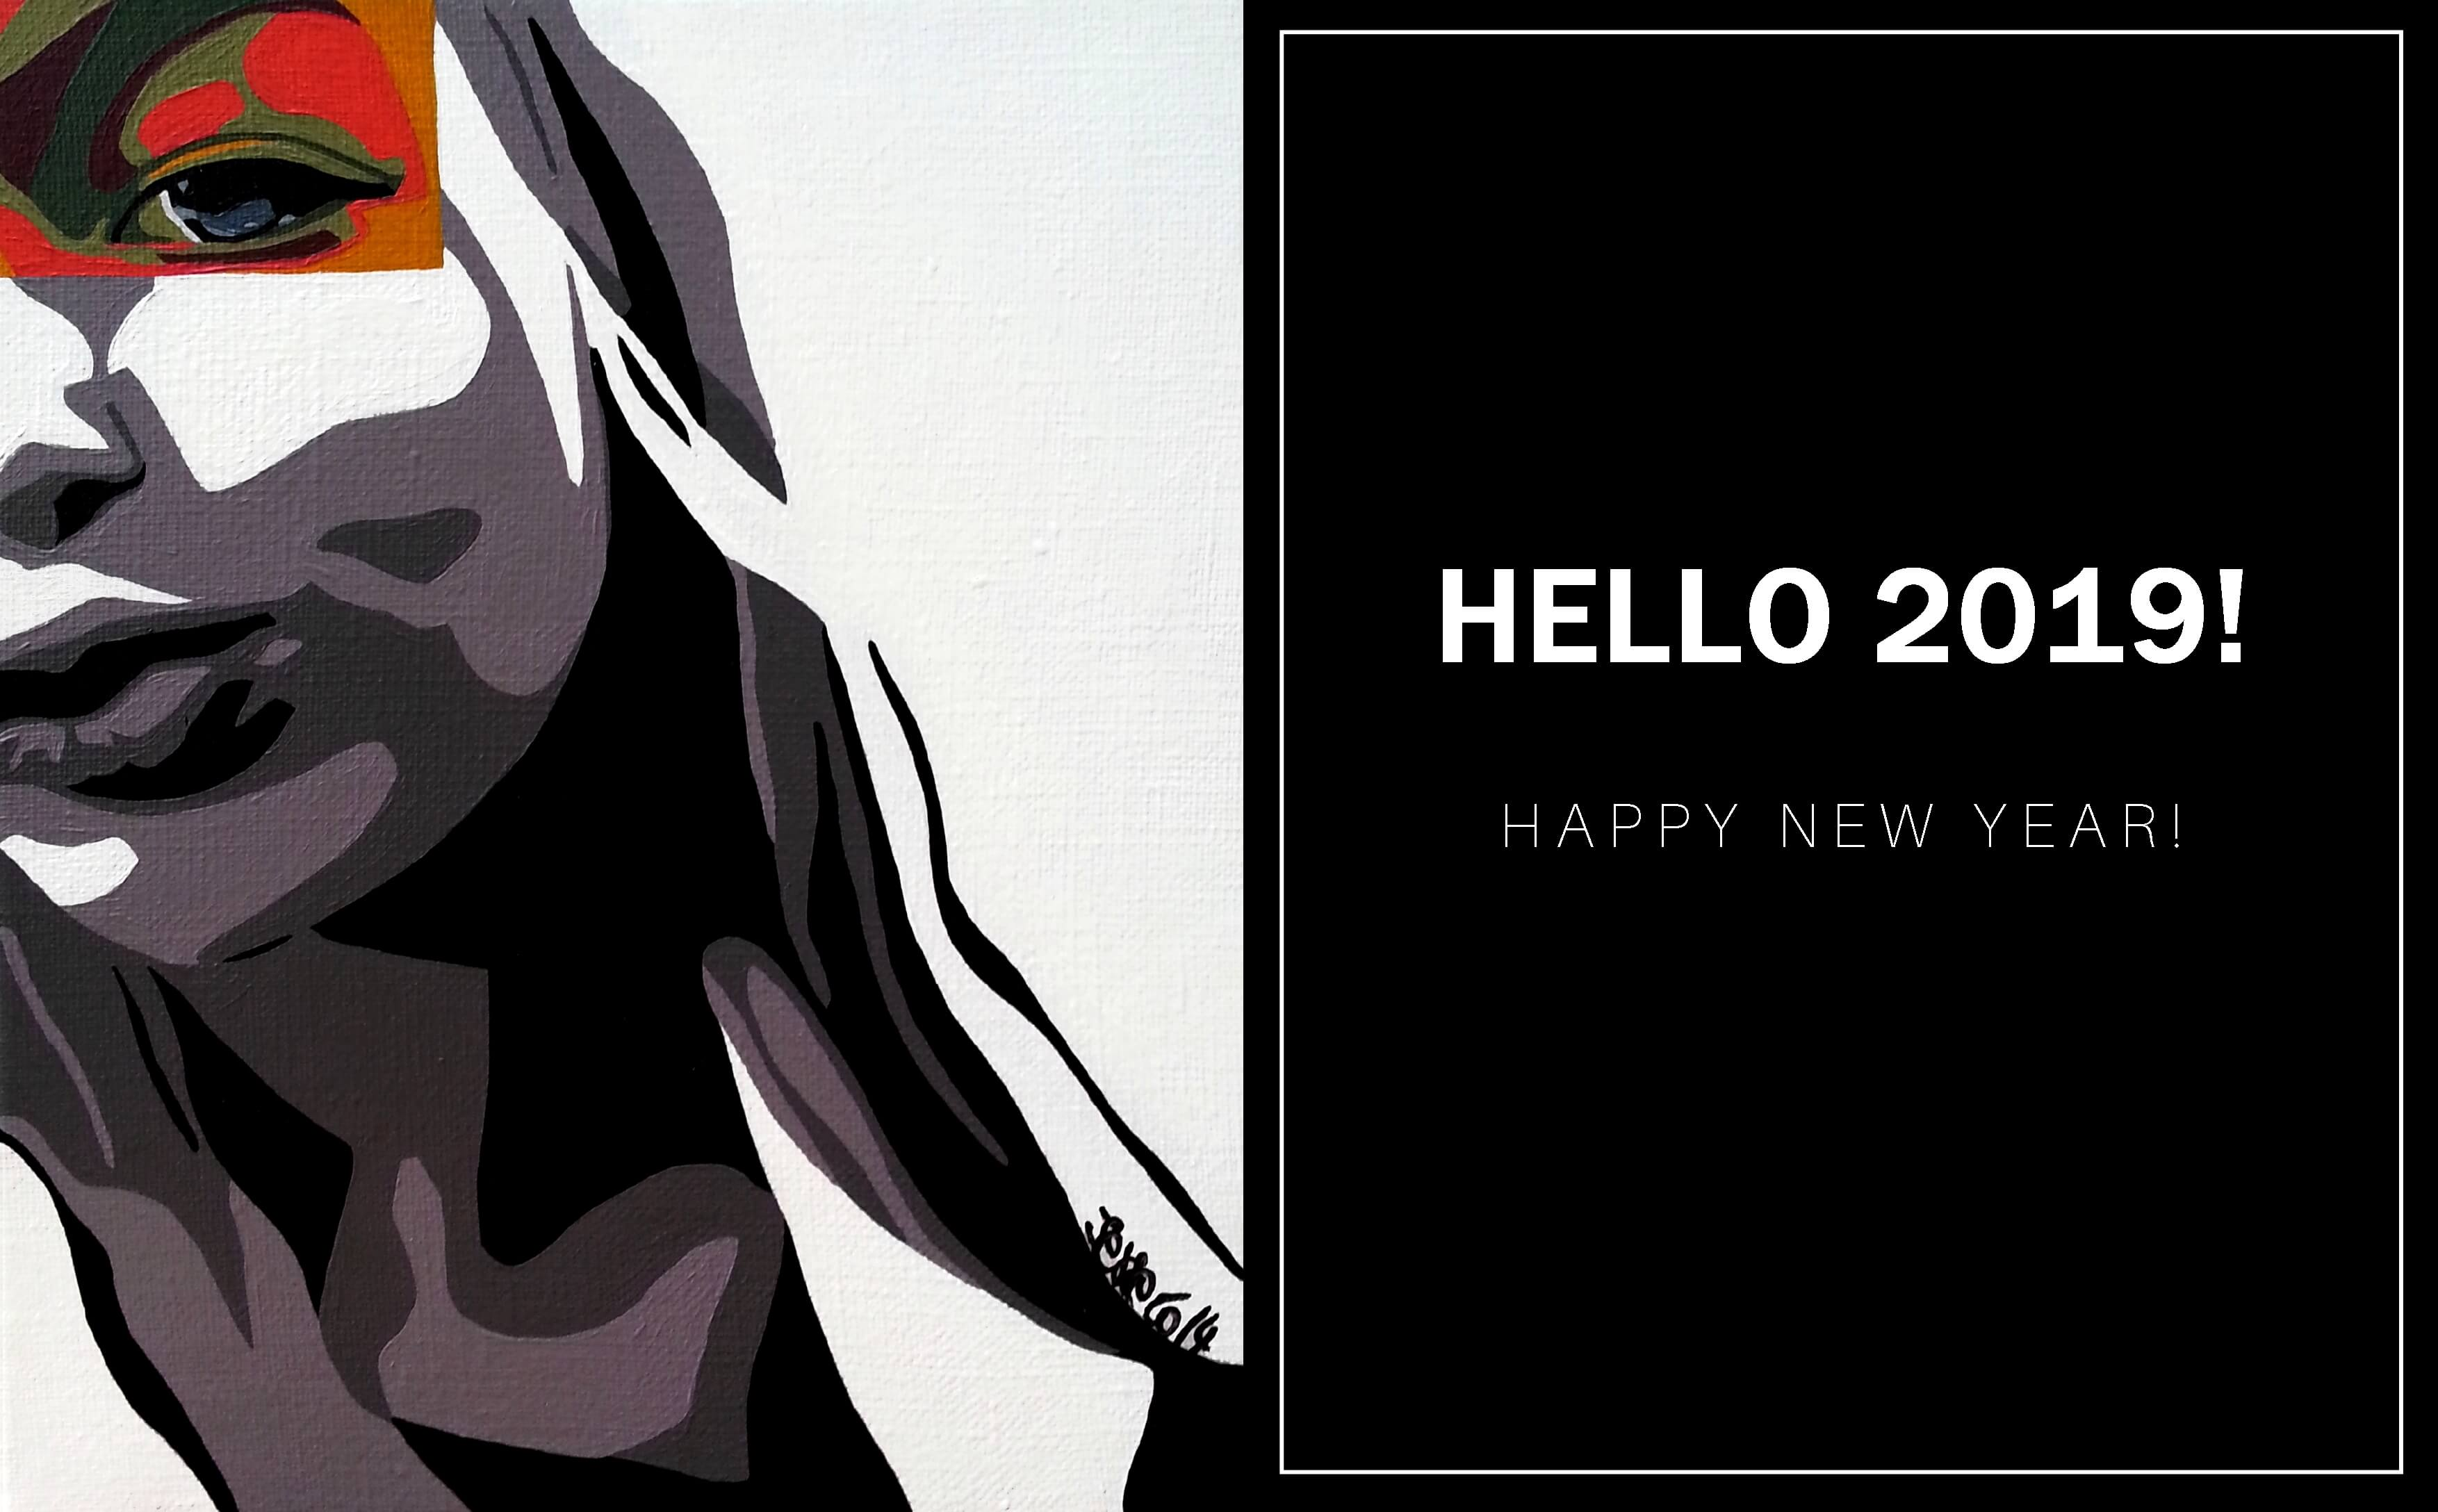 happy new year, new year card, bonne année, 2019, artist life, artiste peintre